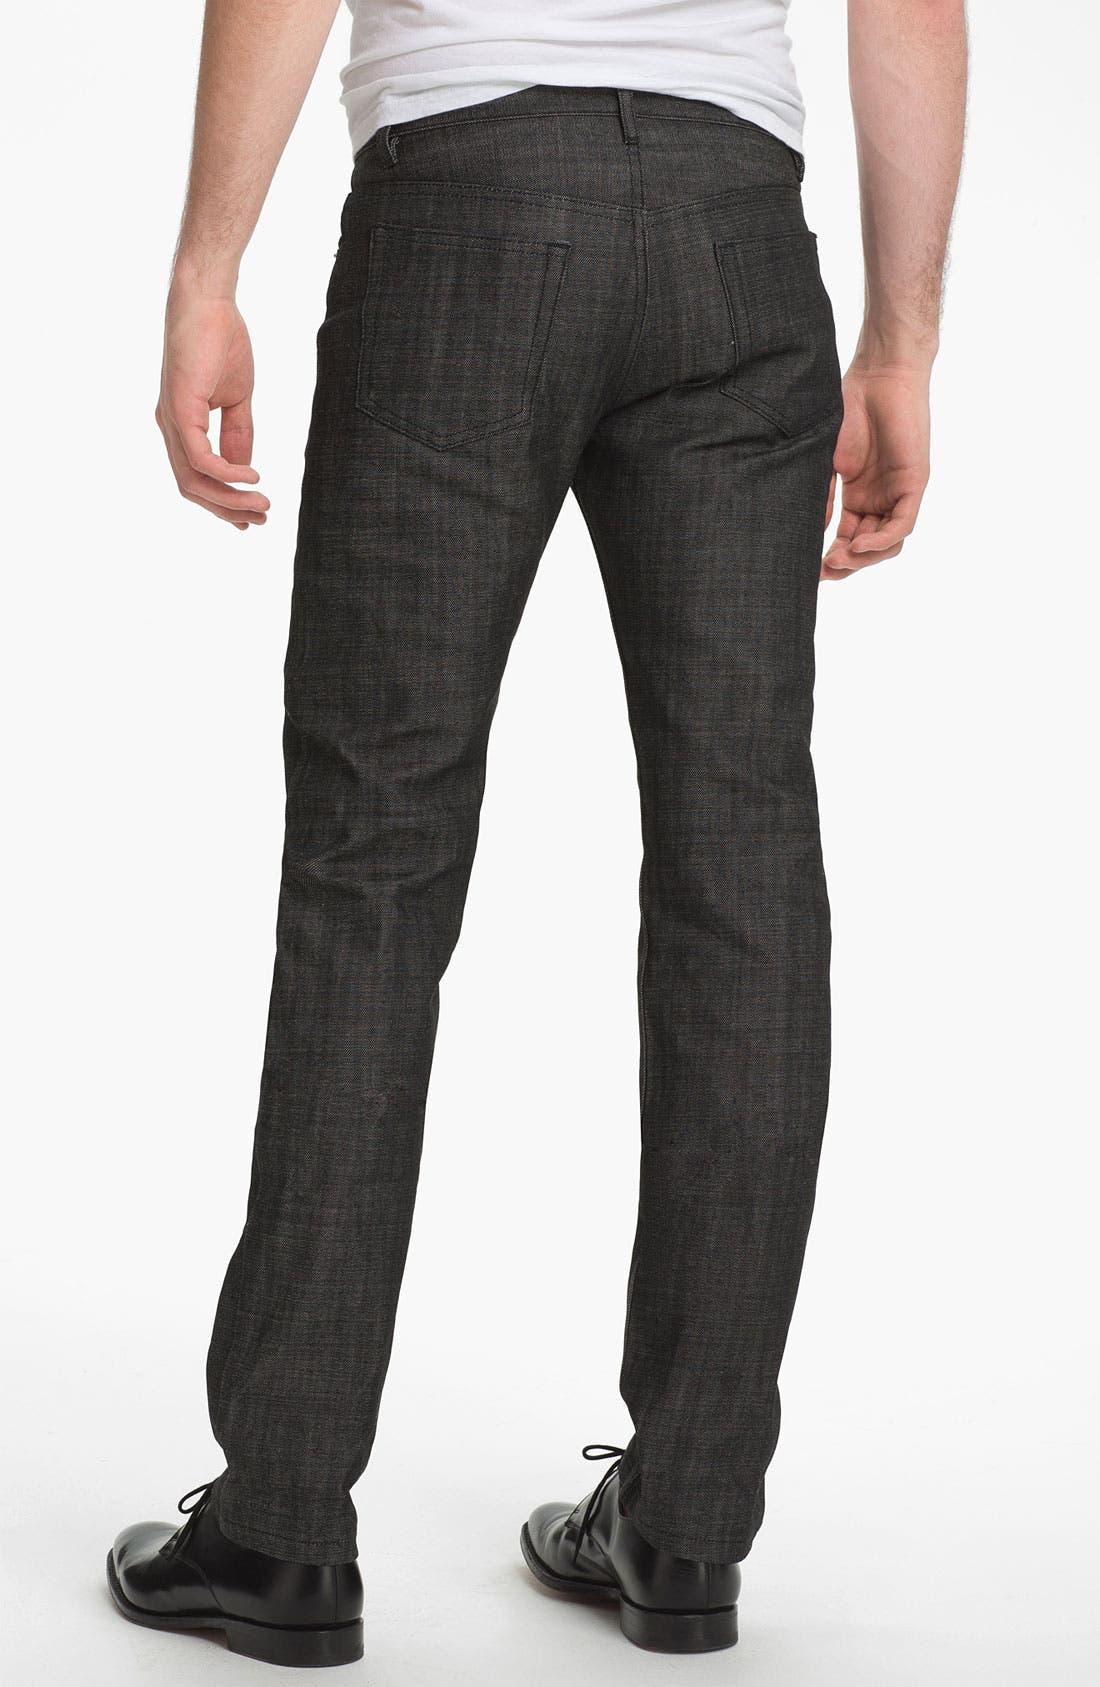 Alternate Image 2  - A.P.C. 'New Standard' Slim Straight Leg Jeans (Black) (Online Only)